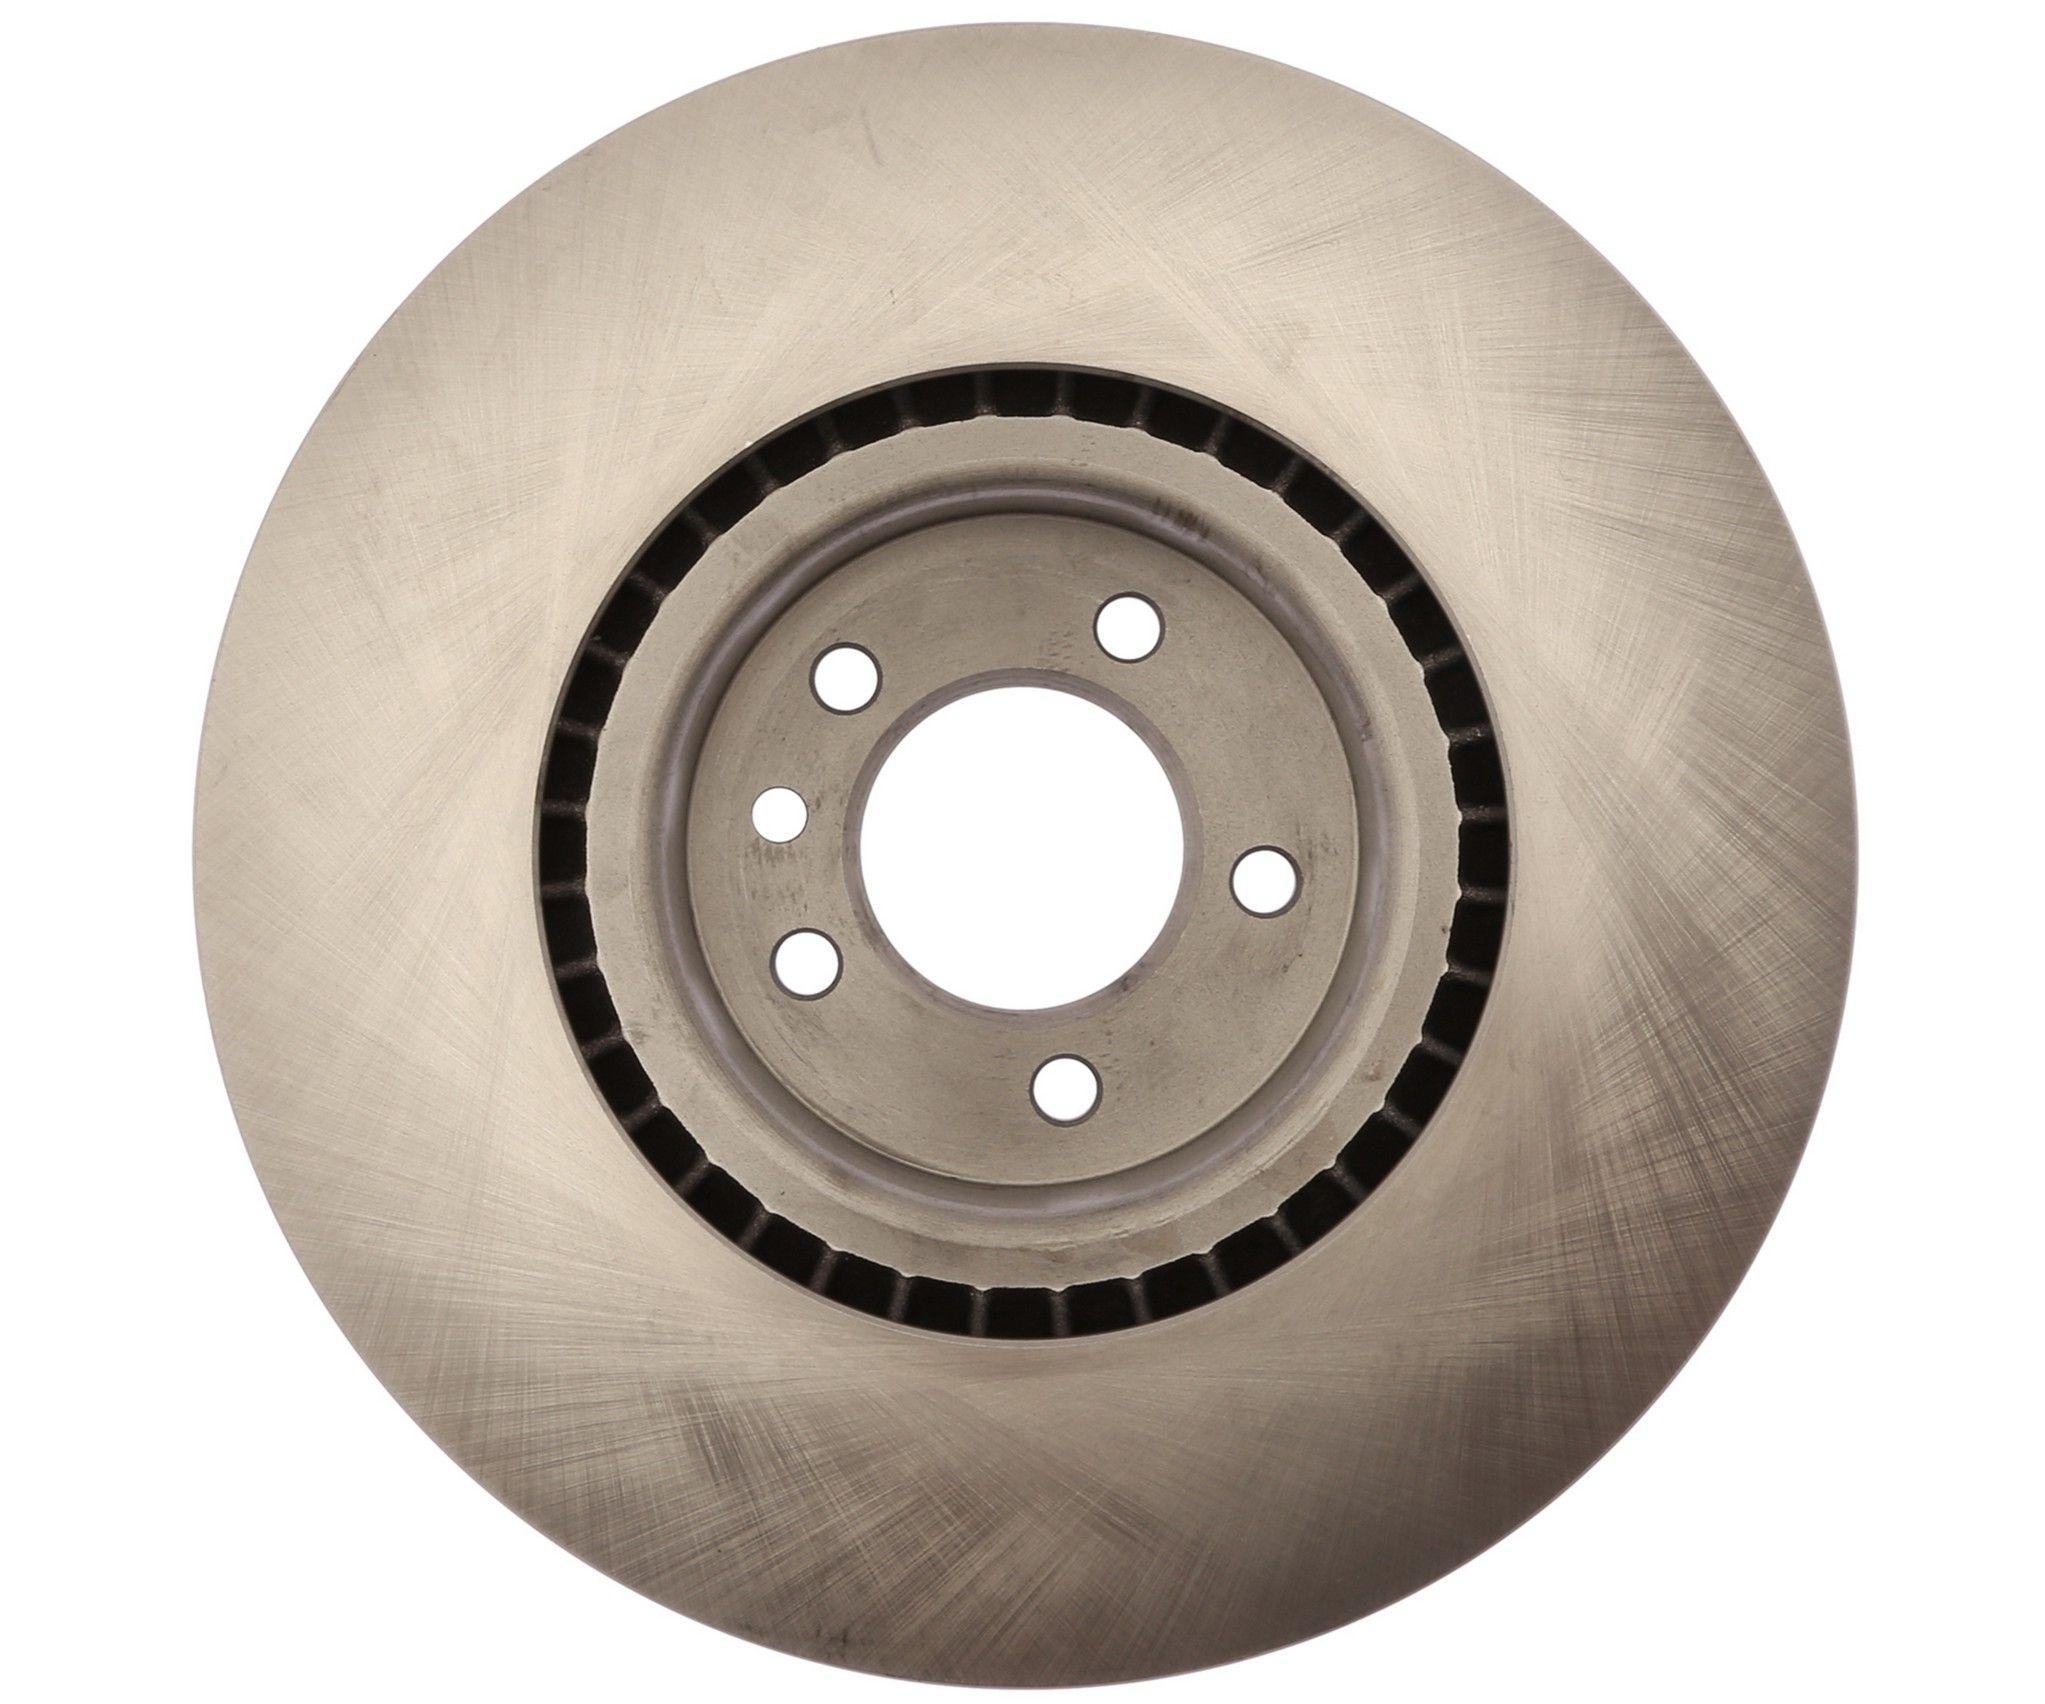 Yana Shiki CA3250 Chrome Swirl Style Curved Design Grip with Flat End Caps